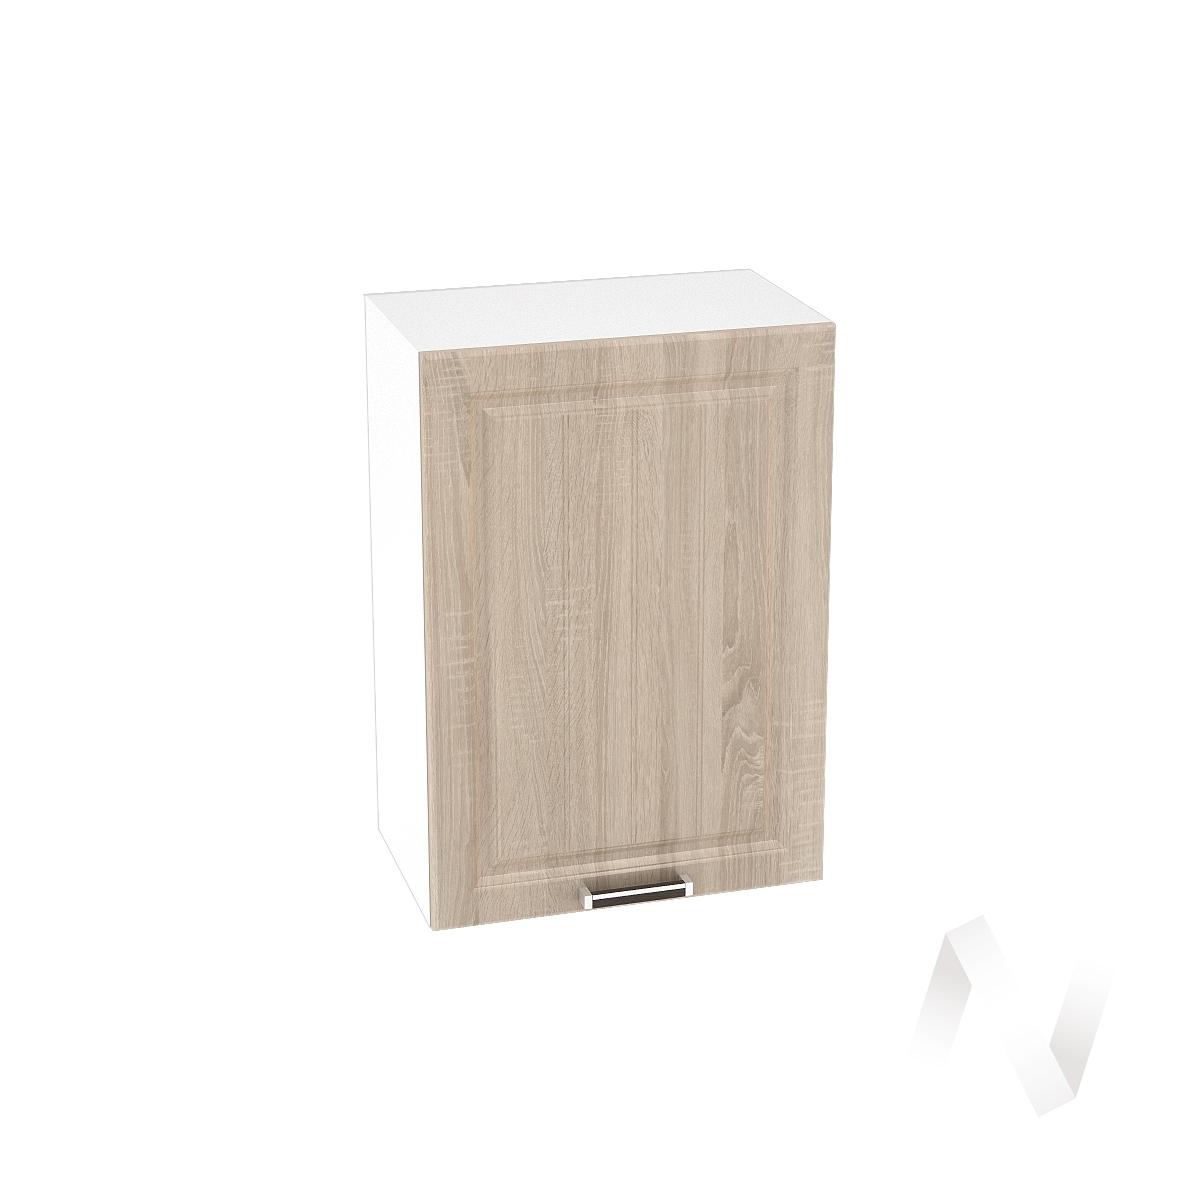 "Кухня ""Прага"": Шкаф верхний 500, ШВ 500 (дуб сонома/корпус белый)"